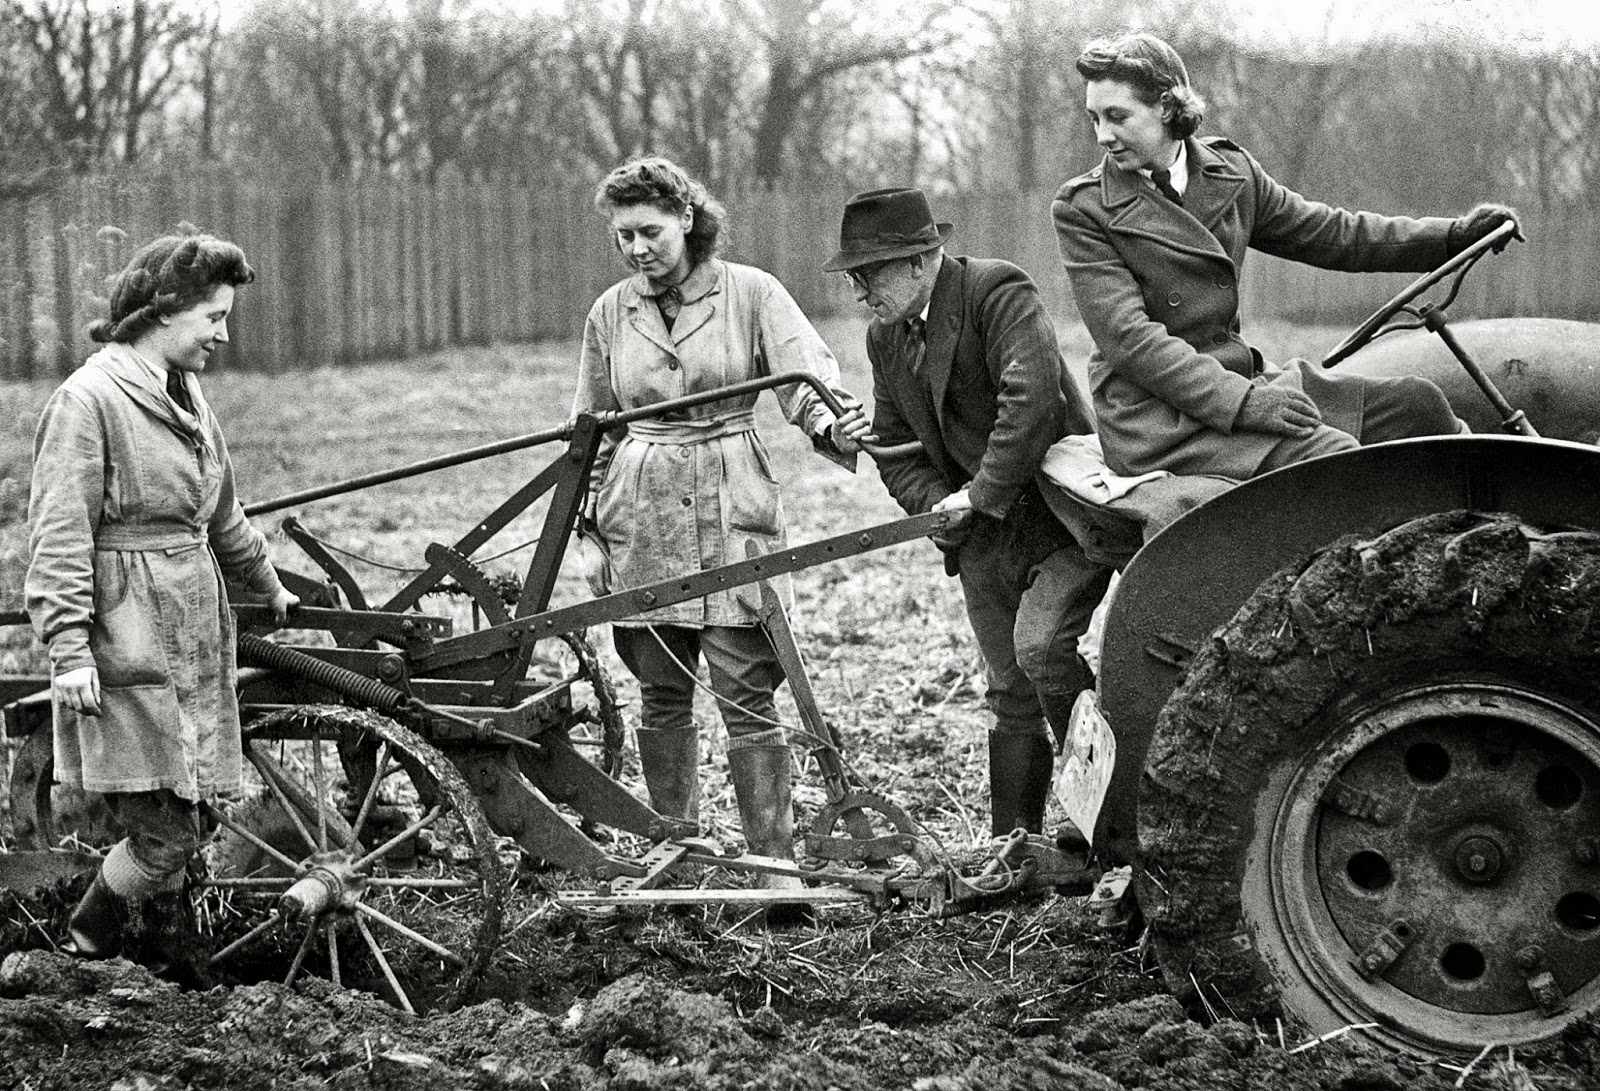 Vintage Photographs of Women in World War II ~ Vintage